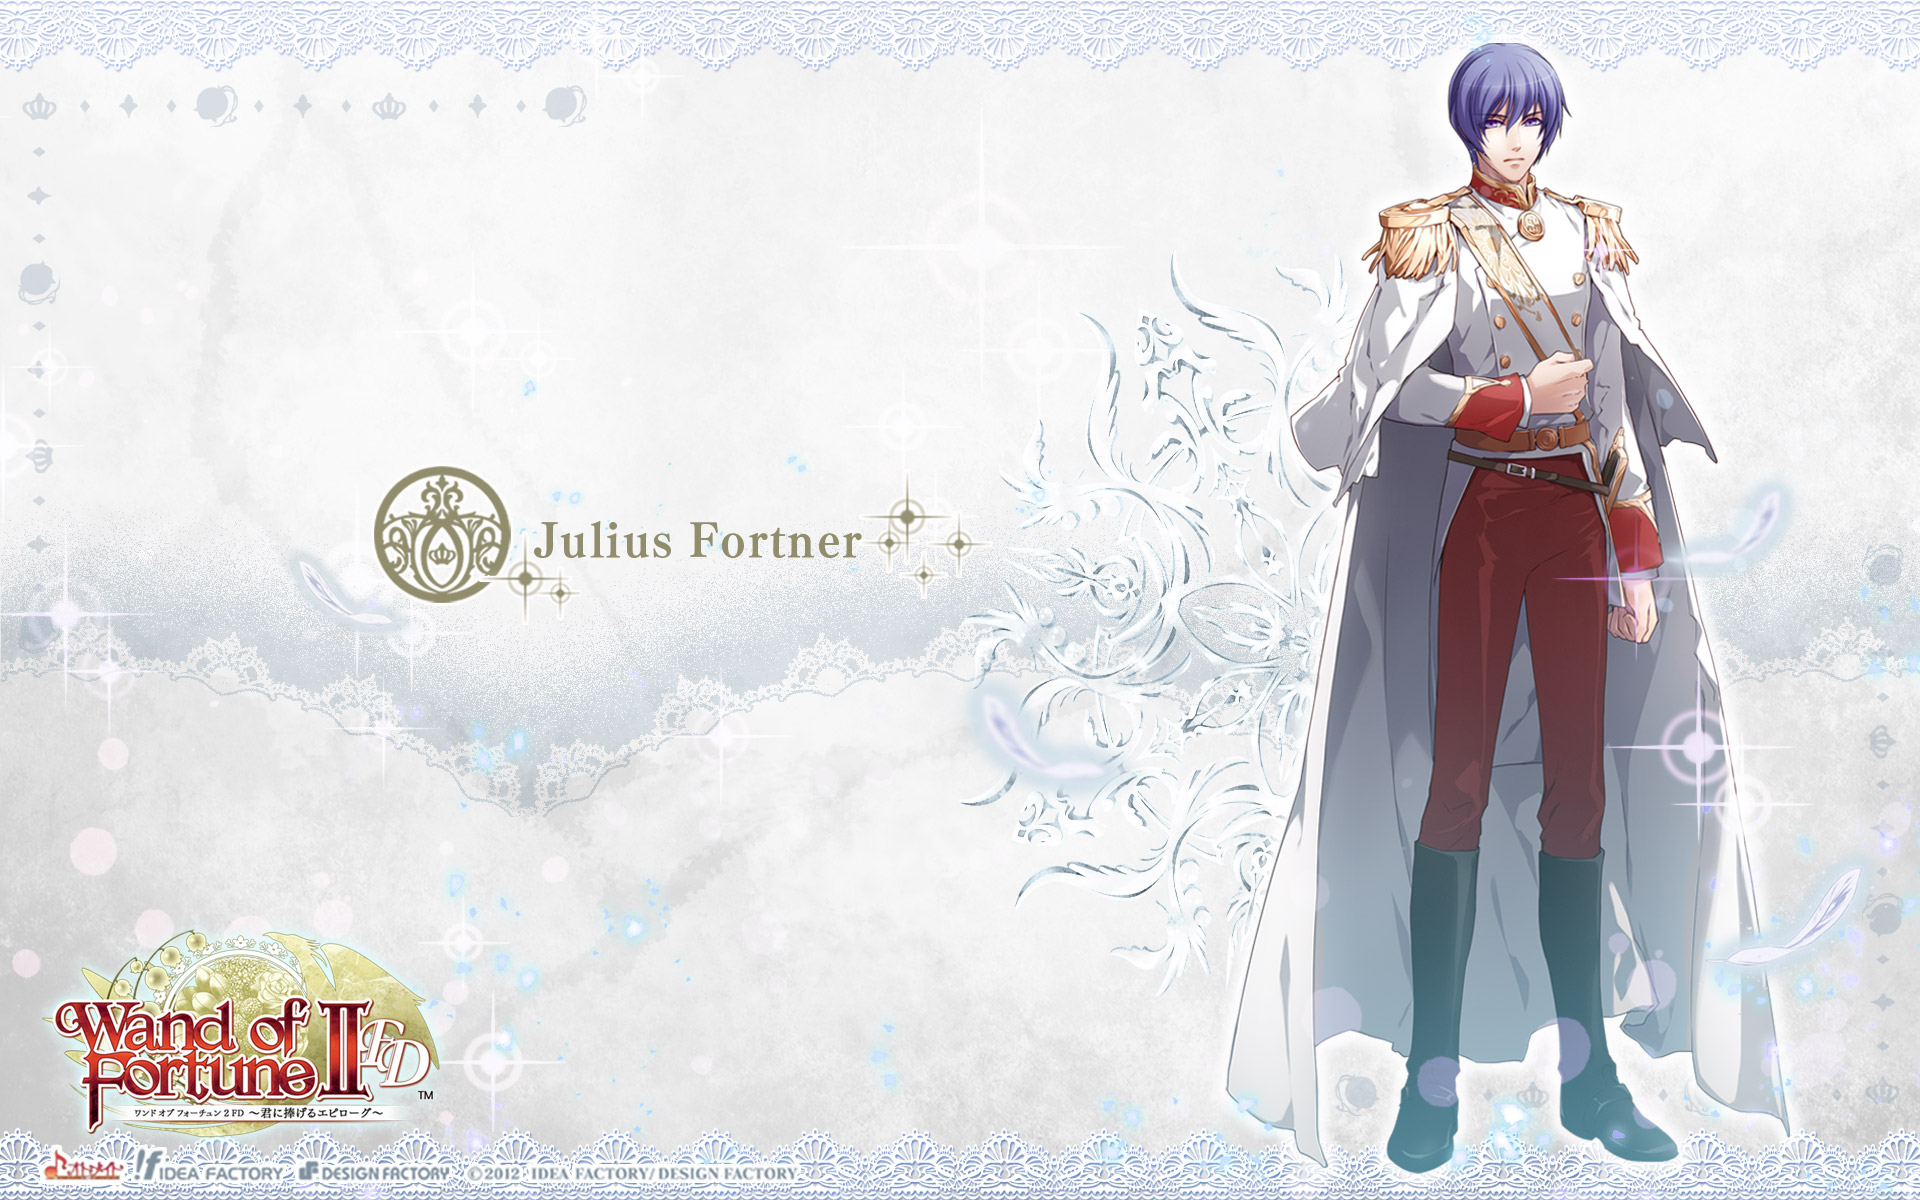 Wand of fortune julius